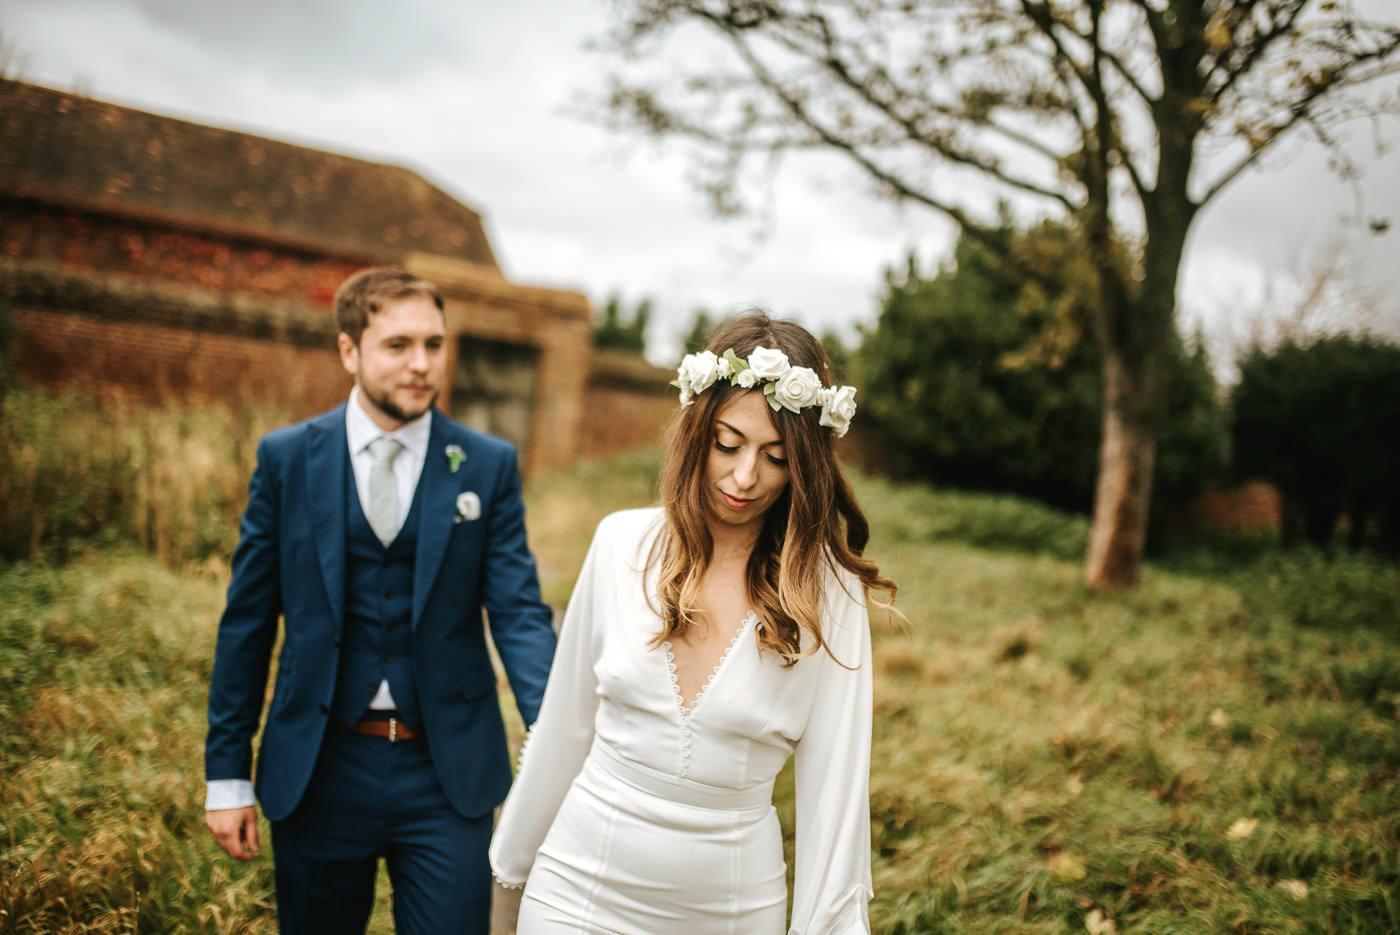 lillibrooke manore wedding couple shoot